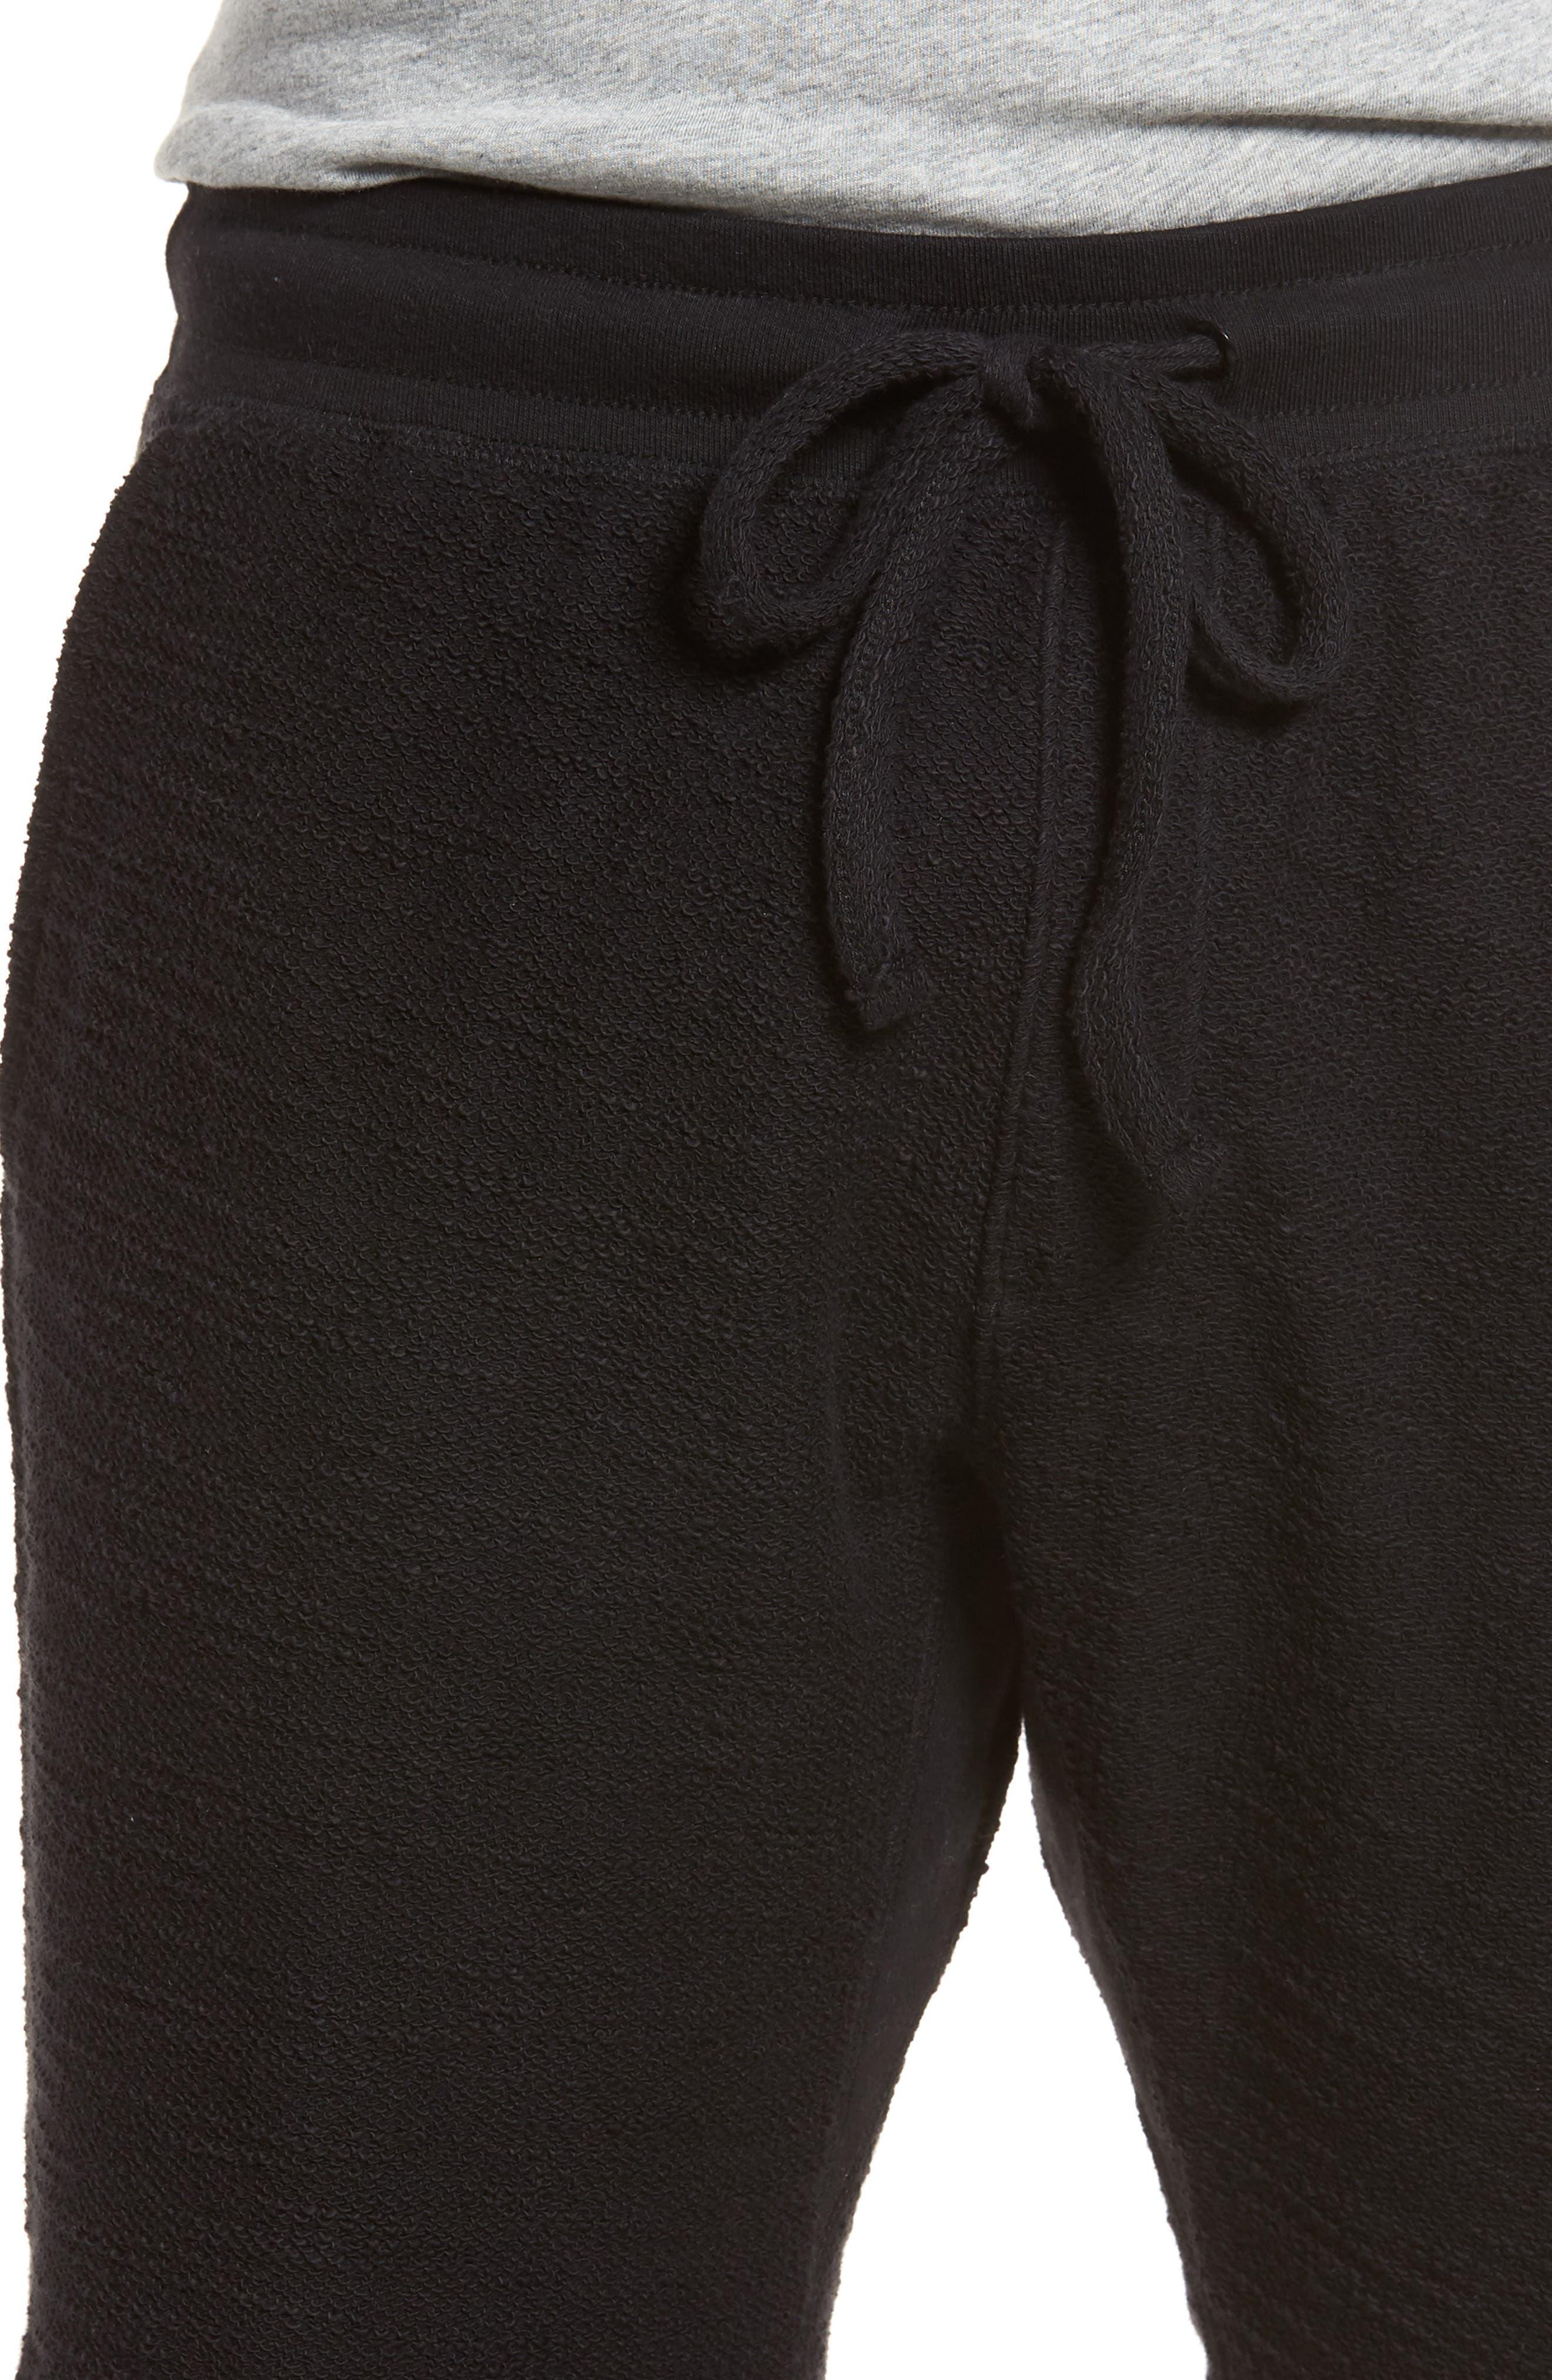 Terry Cotton Blend Shorts,                             Alternate thumbnail 4, color,                             001